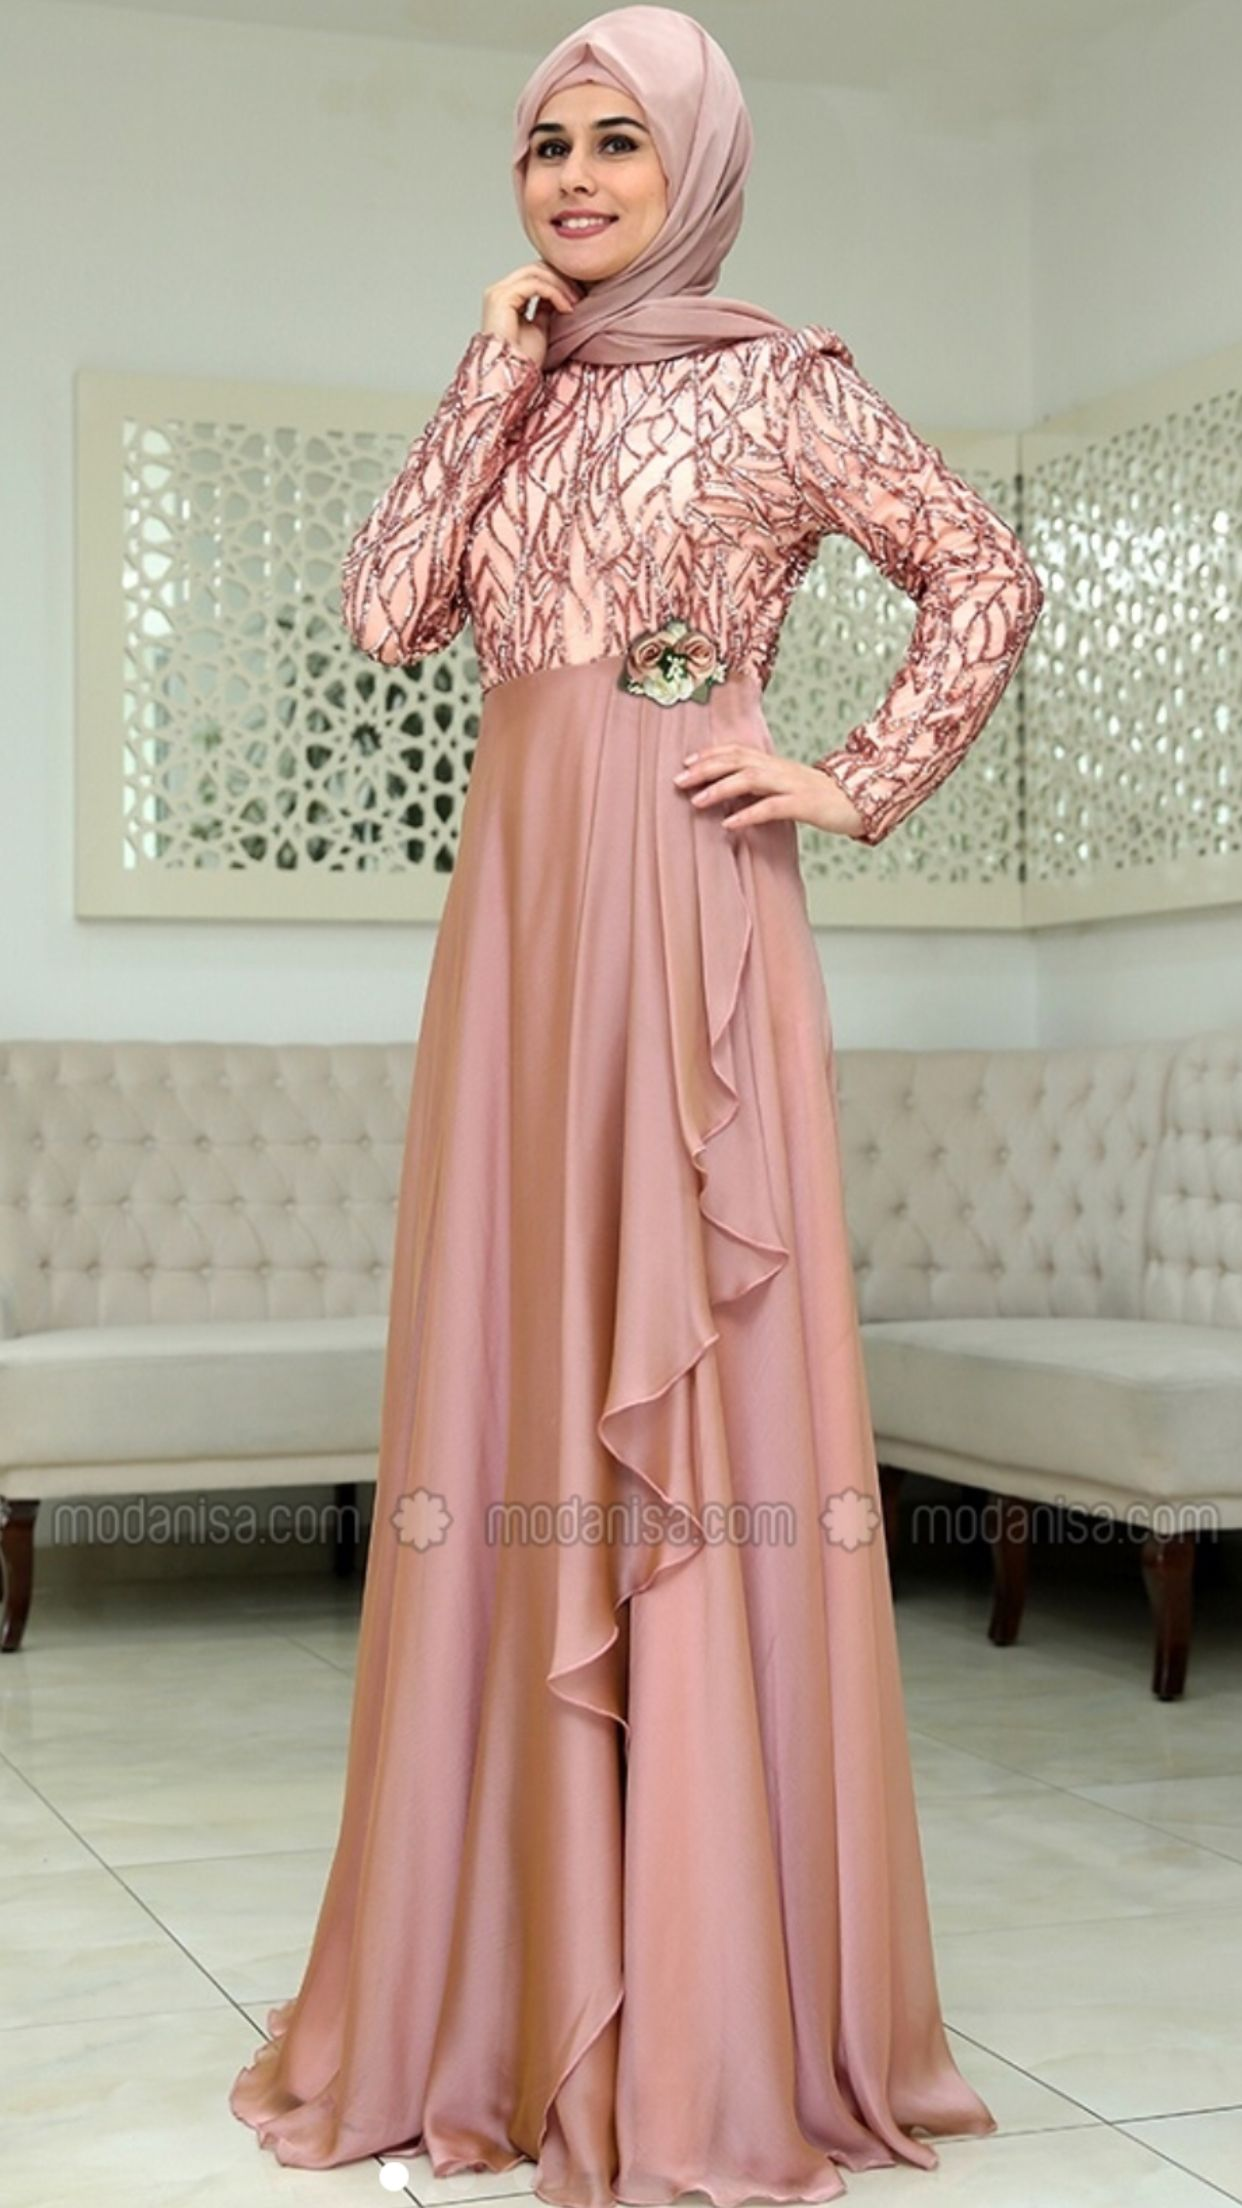 Model Baju Pesta Hijab 2020 : model, pesta, hijab, Desviana, Шитье, Model, Pakaian, Wanita,, Pesta,